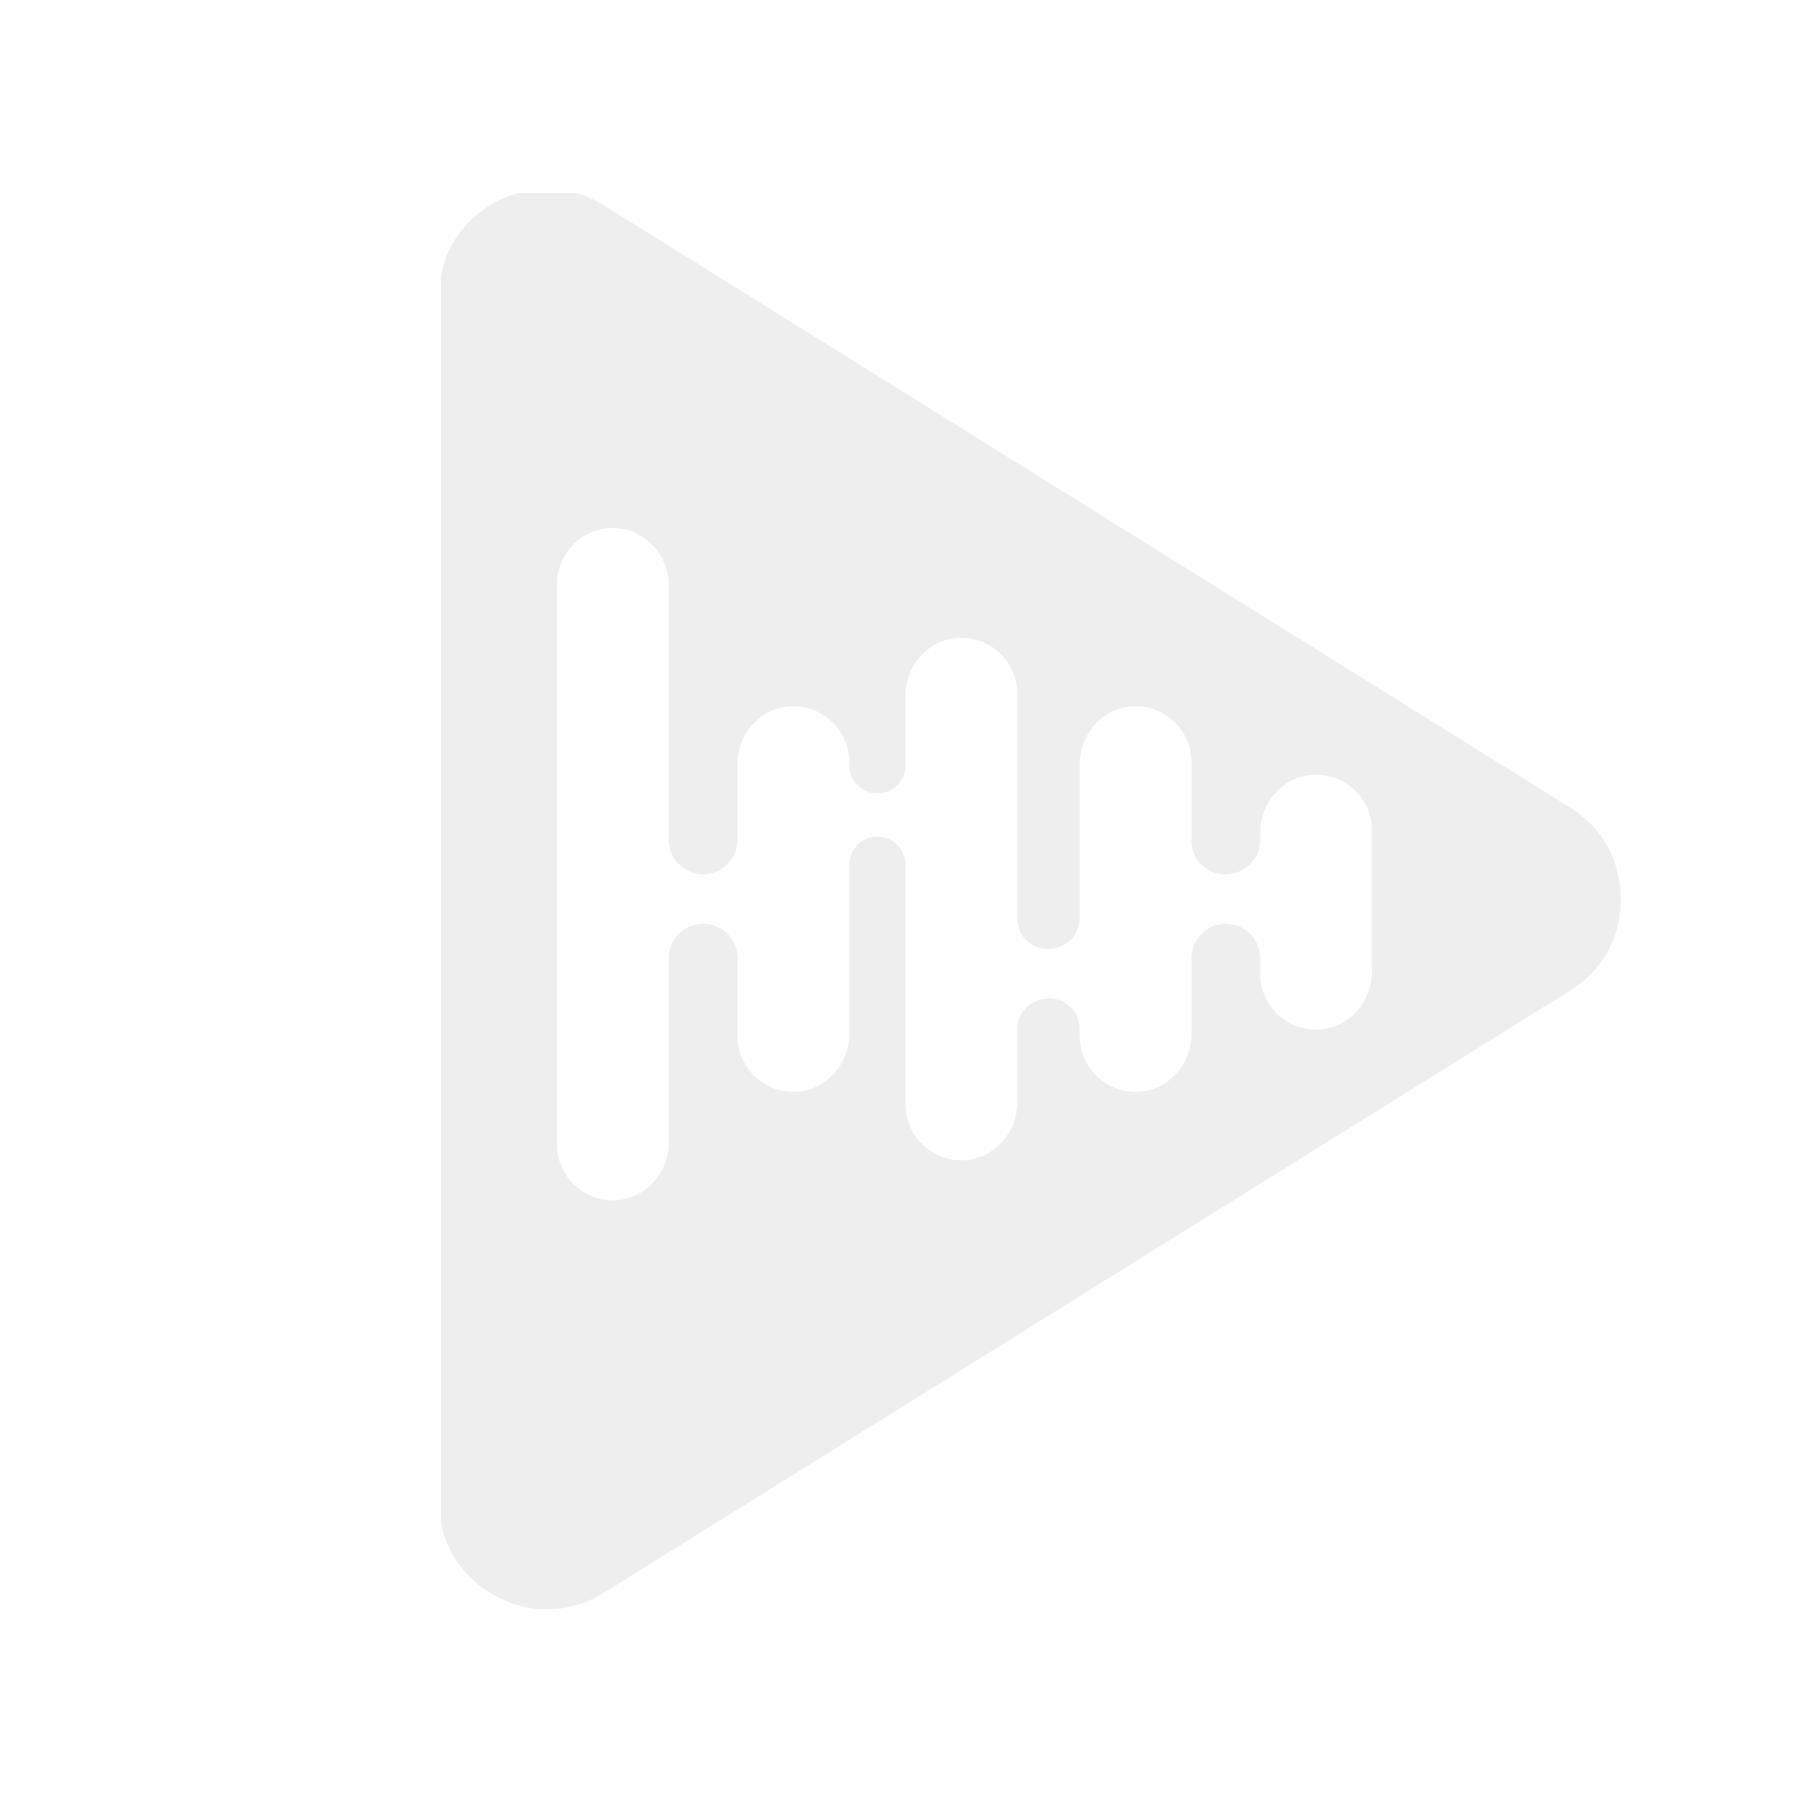 Connect C2850-ACP4